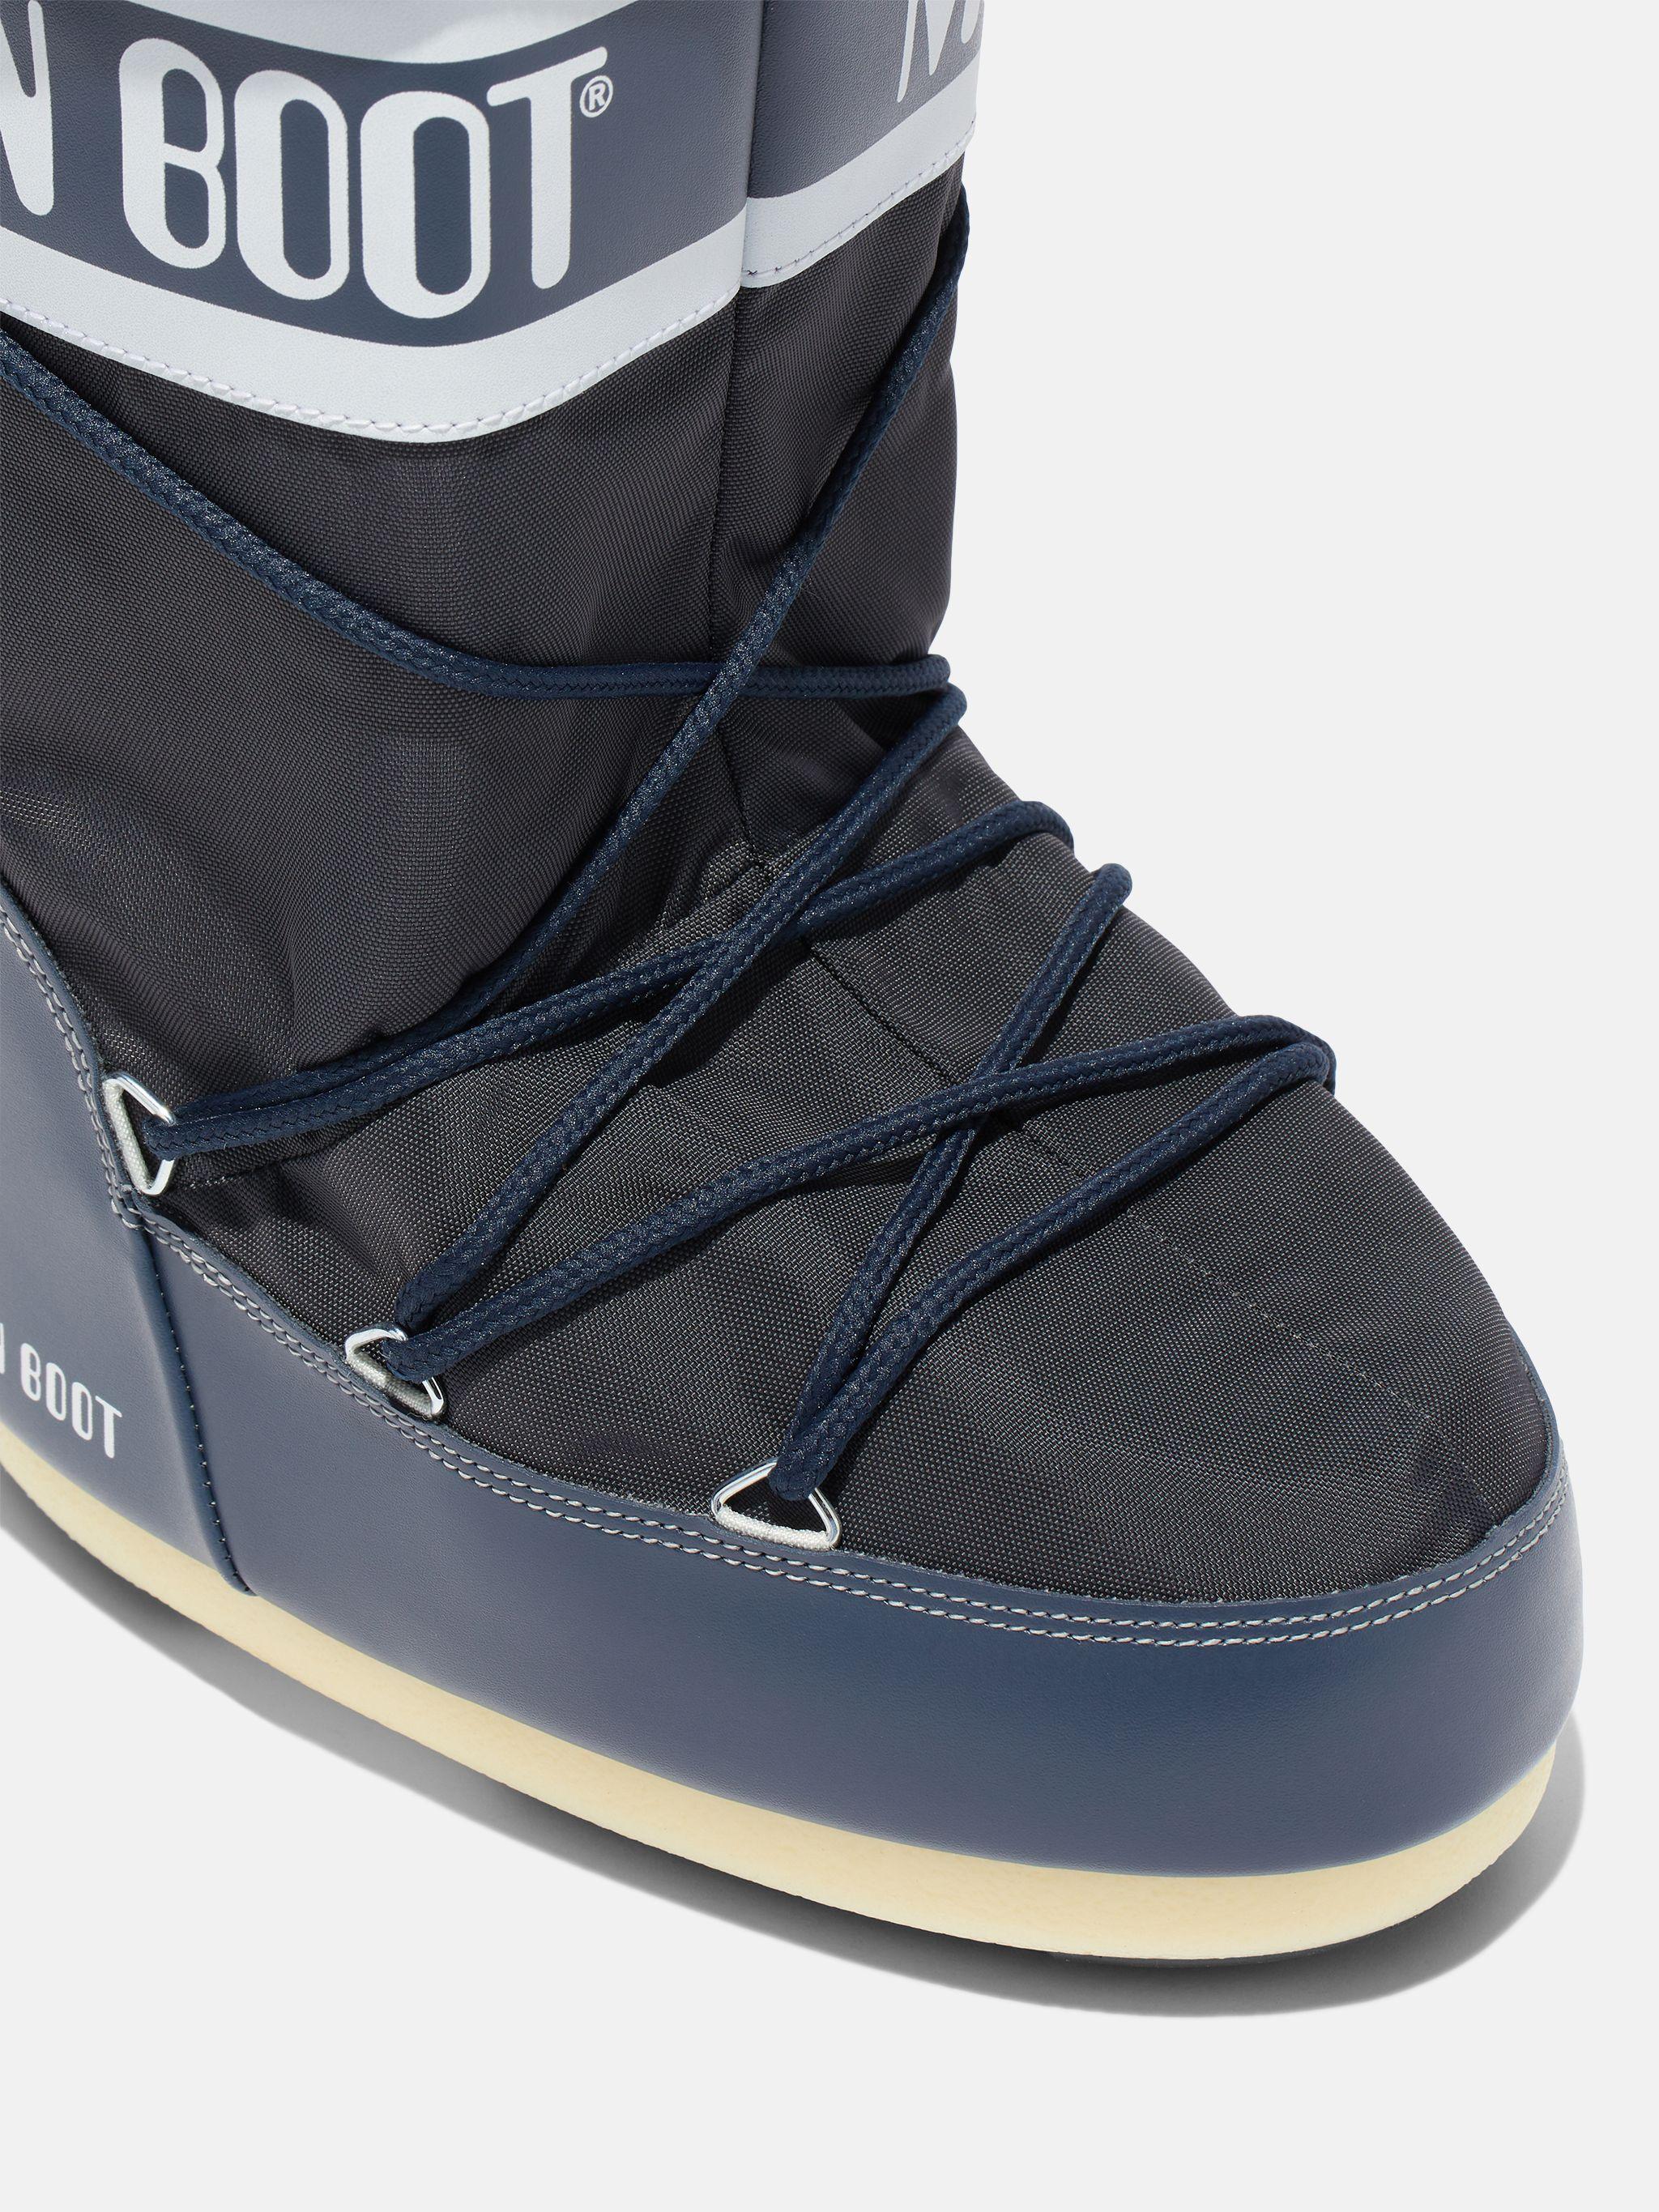 ICON JUNIOR MID-BLUE NYLON BOOTS